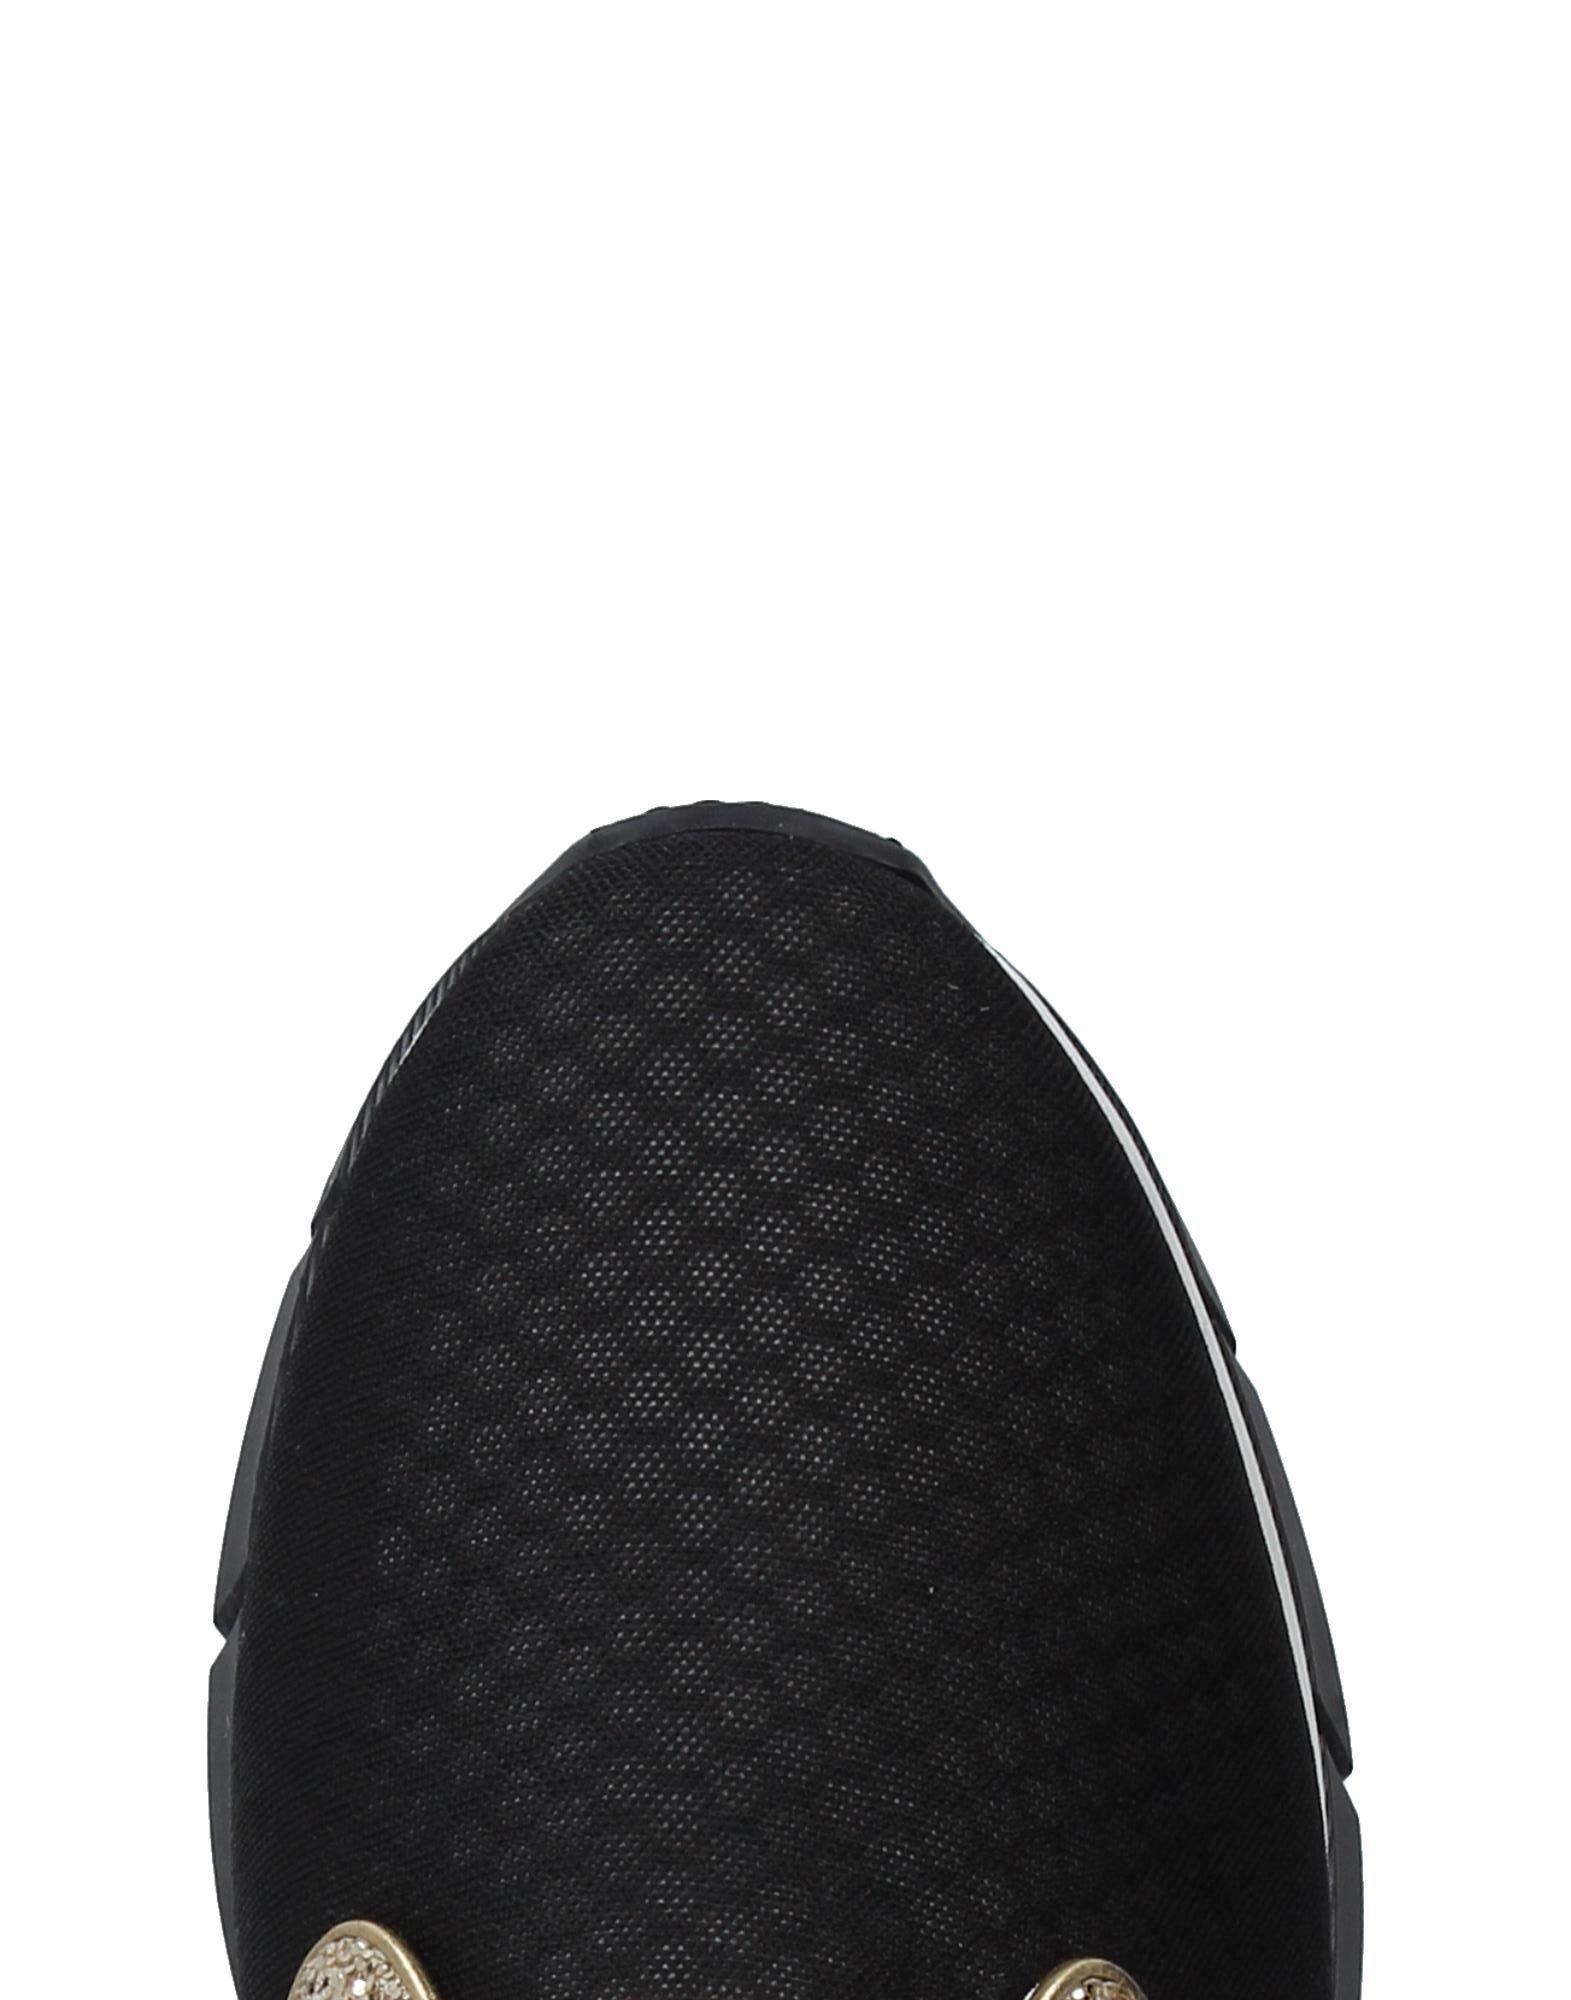 Haltbare  Mode billige Schuhe Barracuda Sneakers Damen  Haltbare 11415981BA Heiße Schuhe 4d8ec2